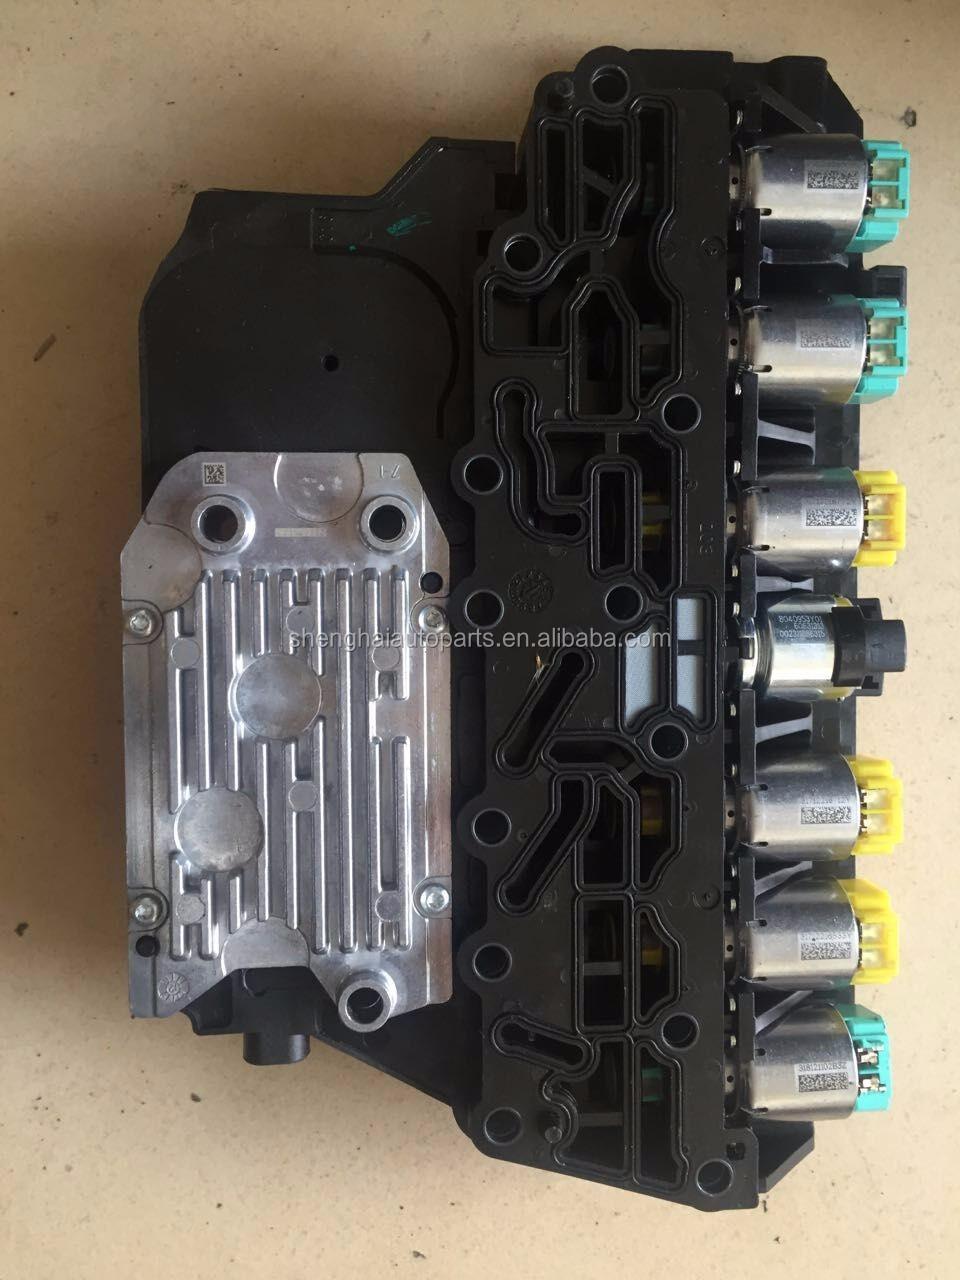 24265789 24264425 24265992 Automatic Transmission Parts